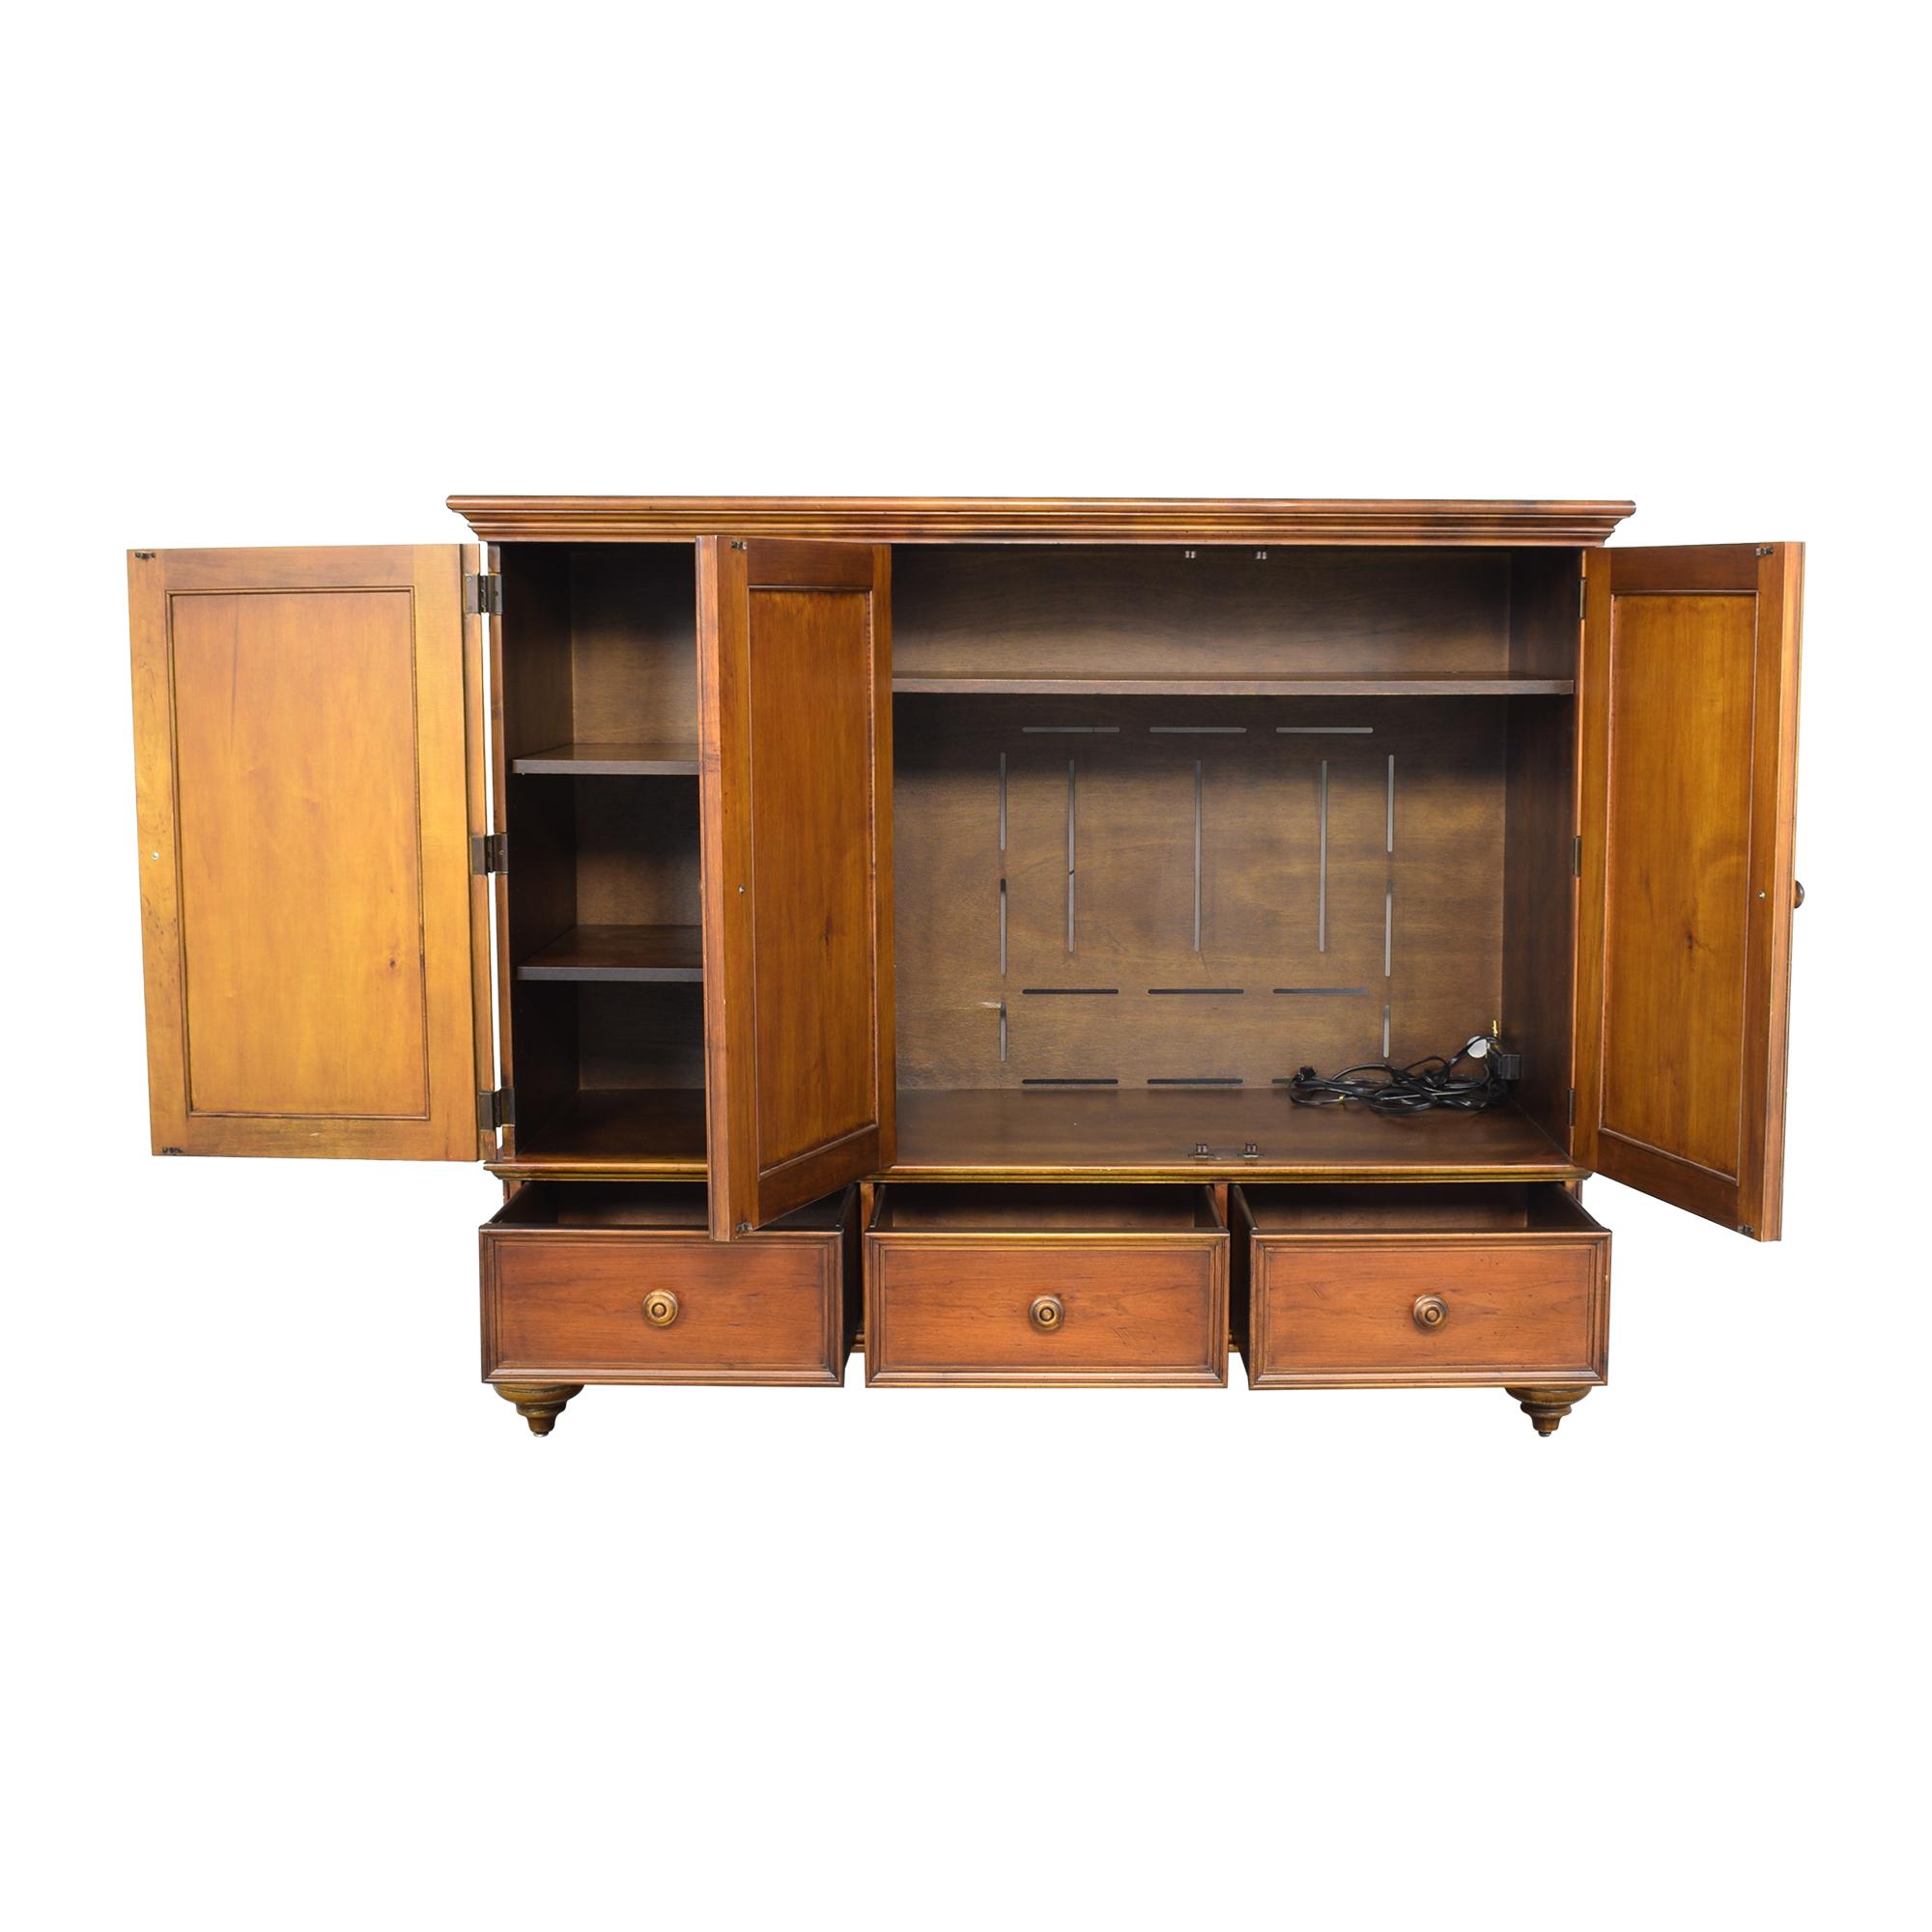 Romweber Armoire / Cabinets & Sideboards